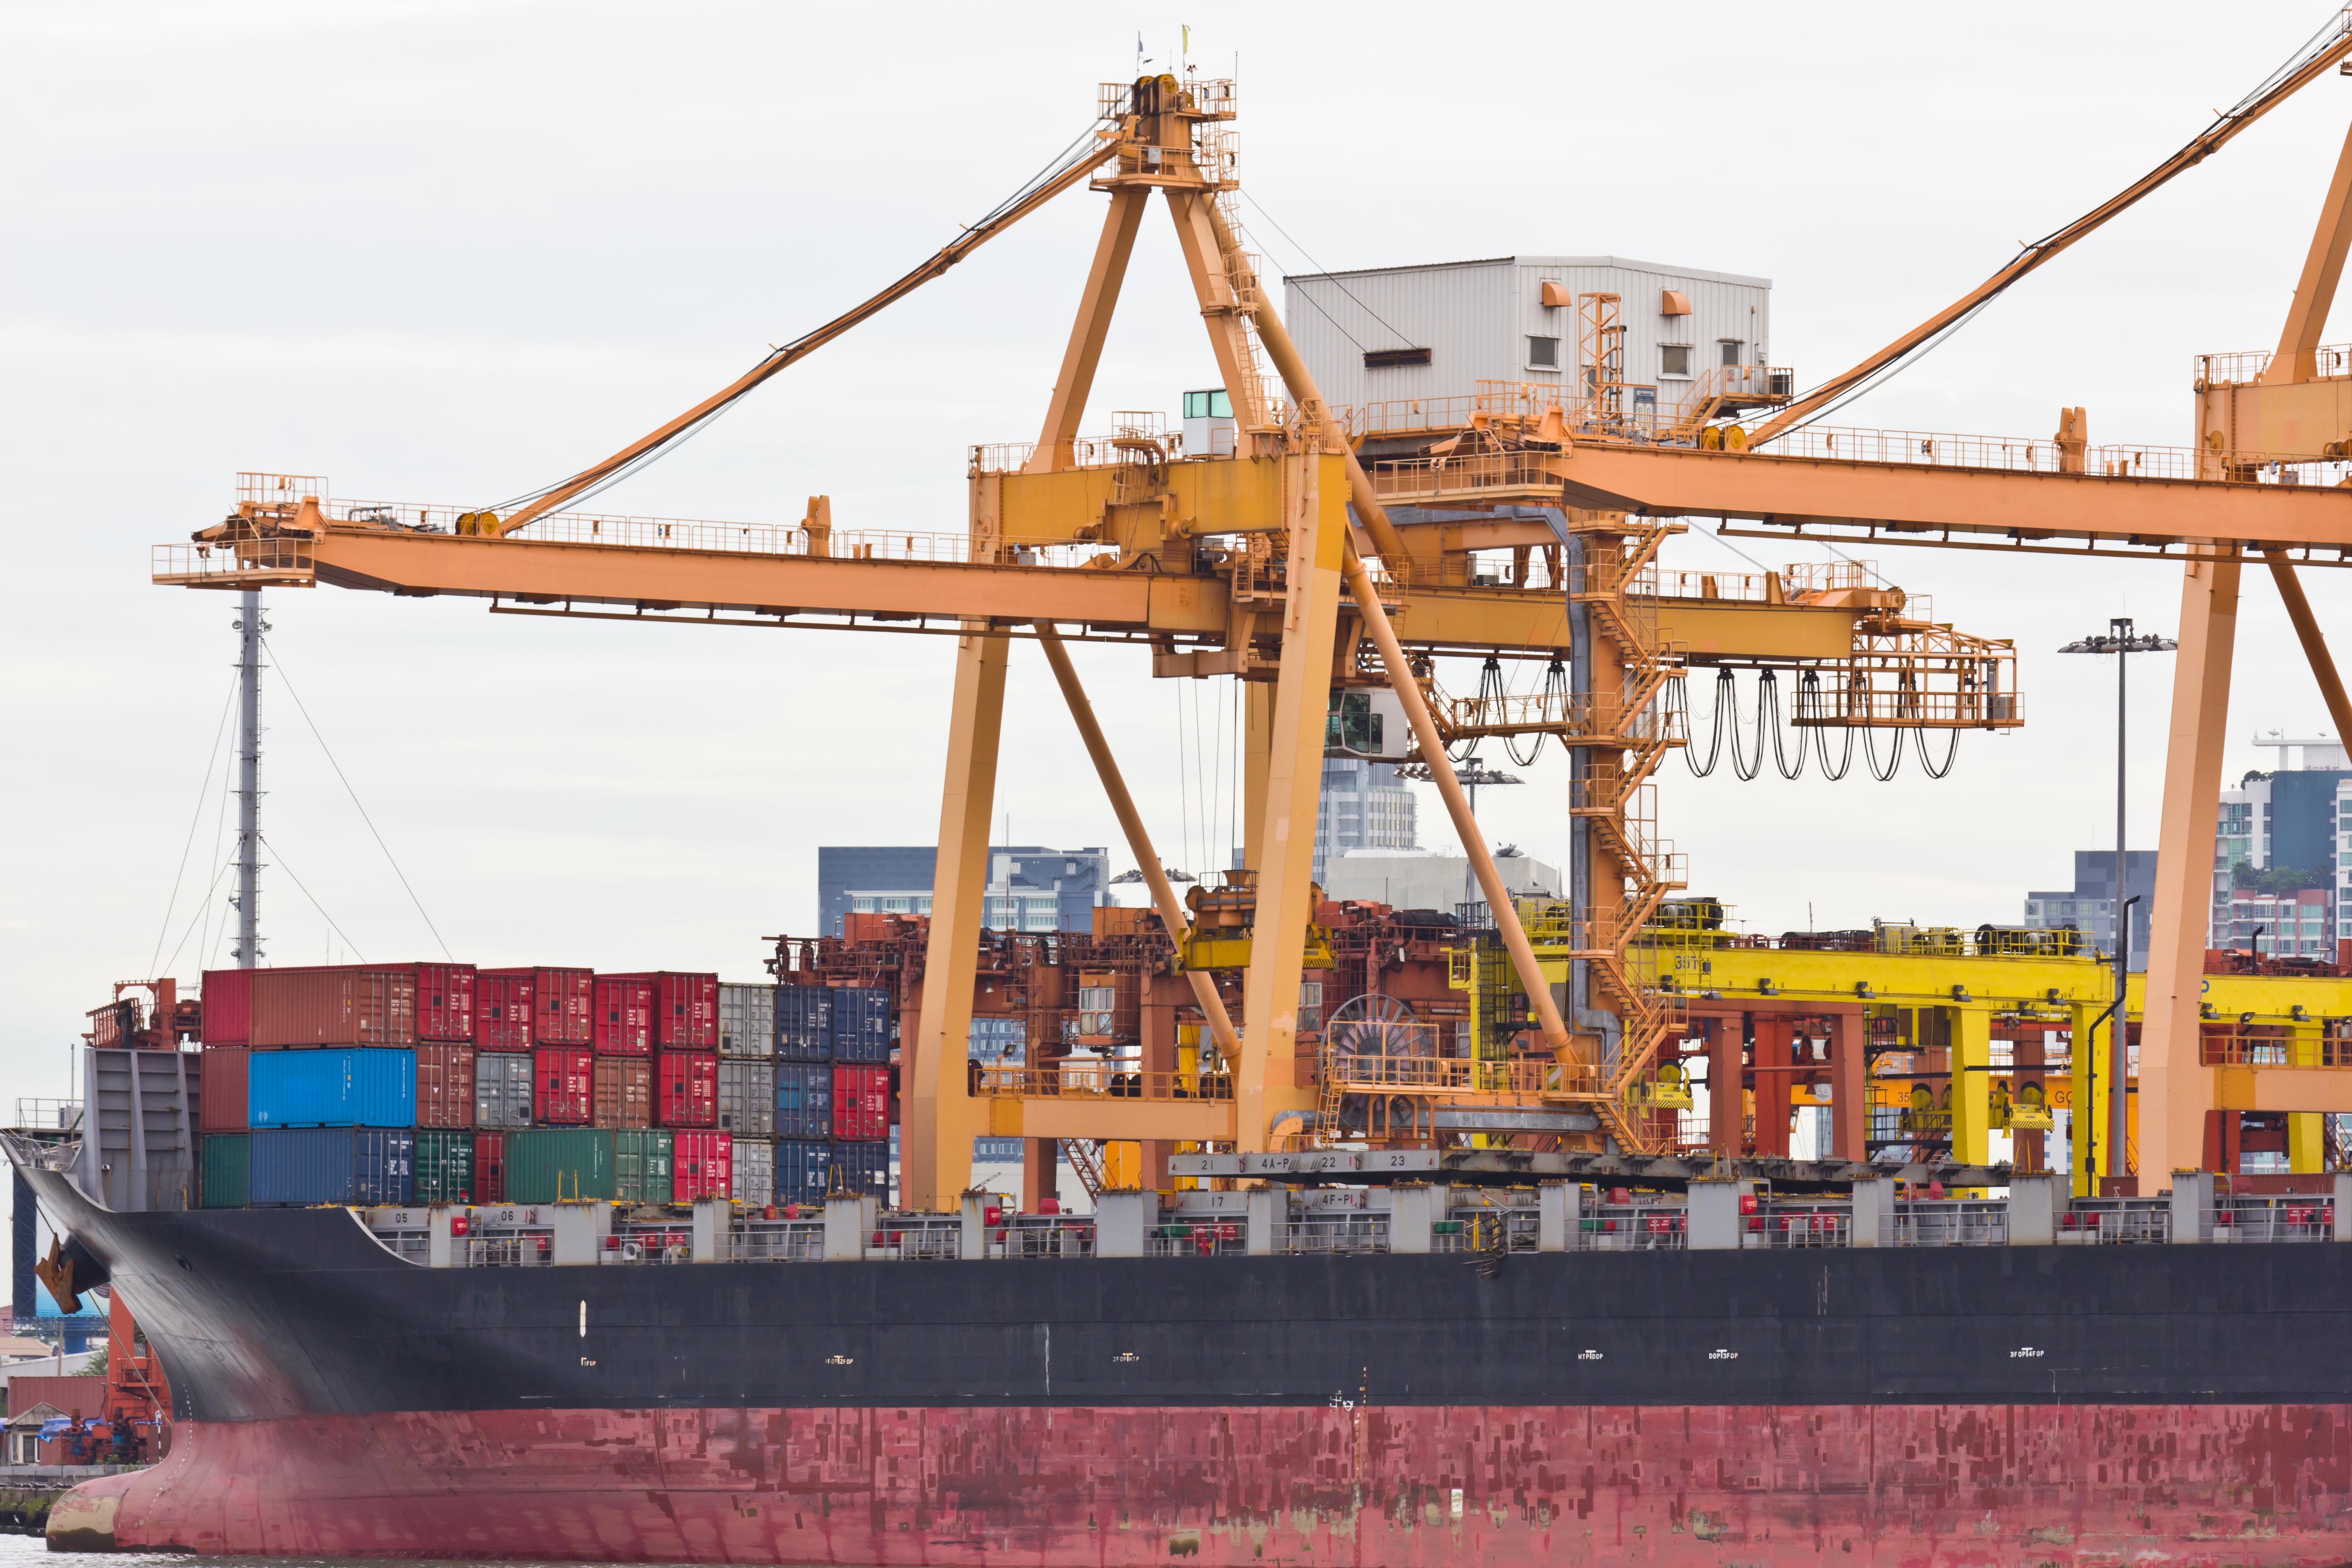 containe, fragt, eksport